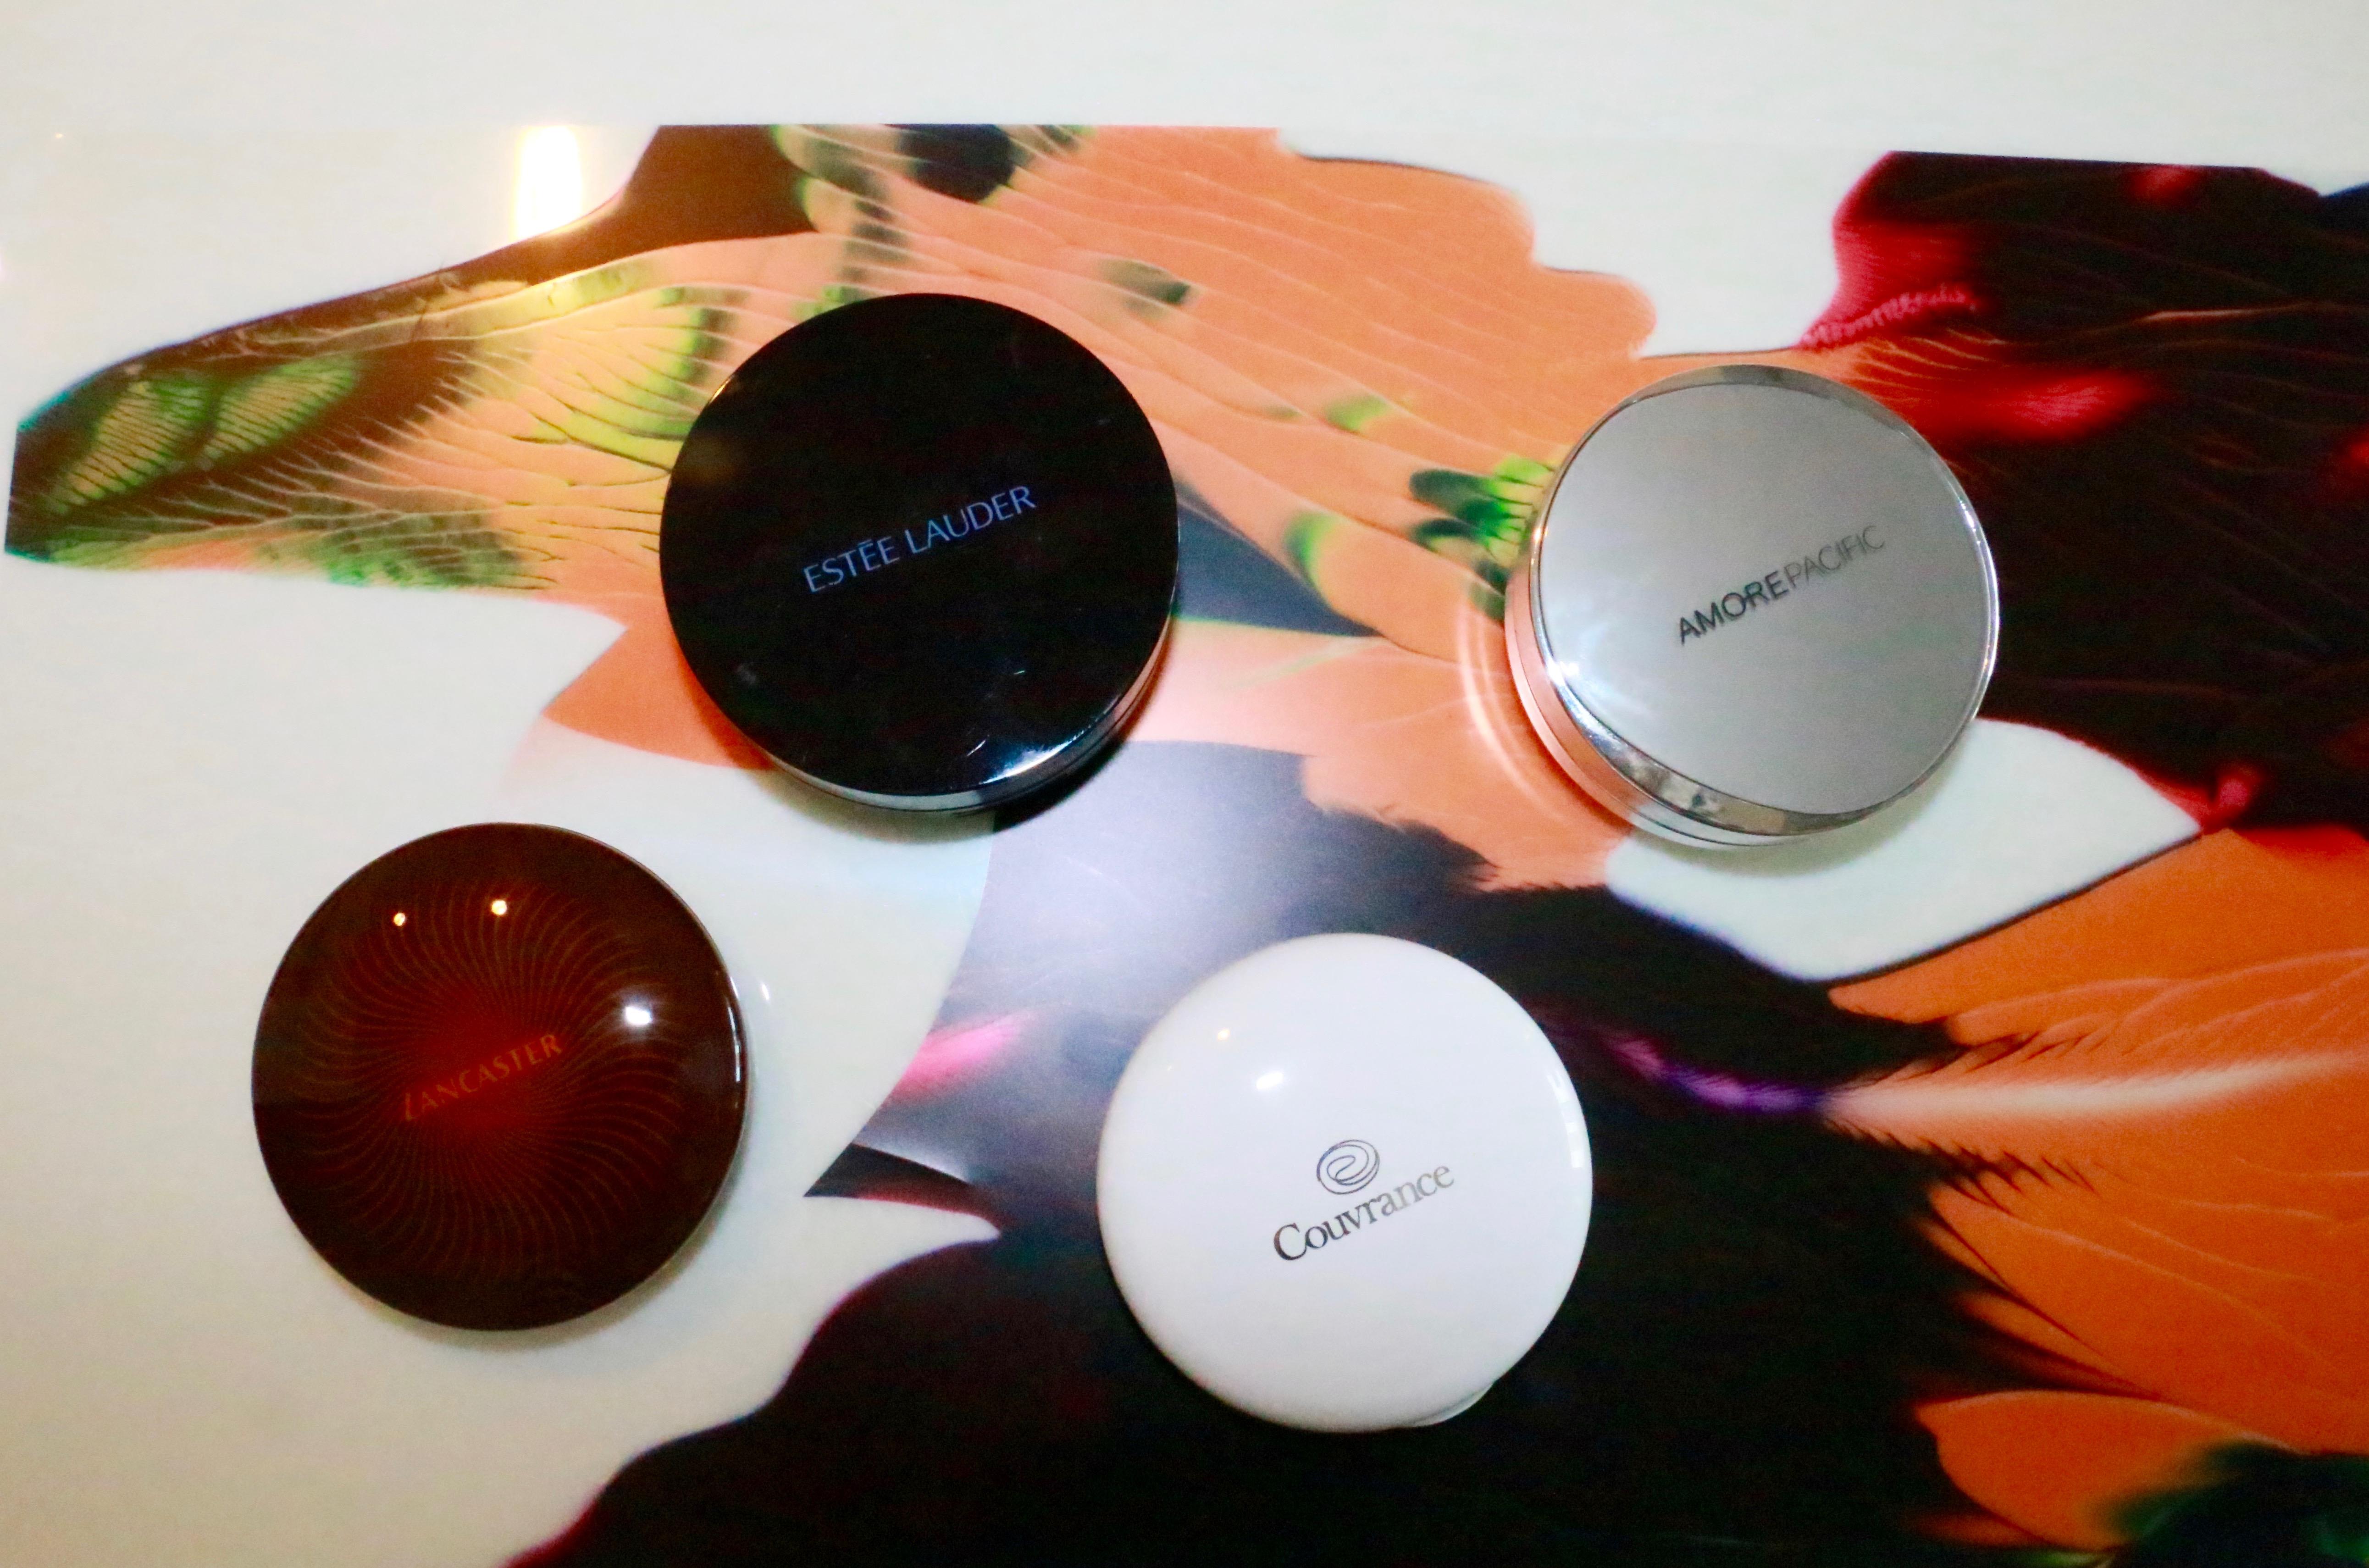 Estee Lauder Double Wear MakeUp to Go , Amore Pacific Color Control Cushion Compact , Avene Compact Foundation Creams , Lancaster 365 Sun Compact